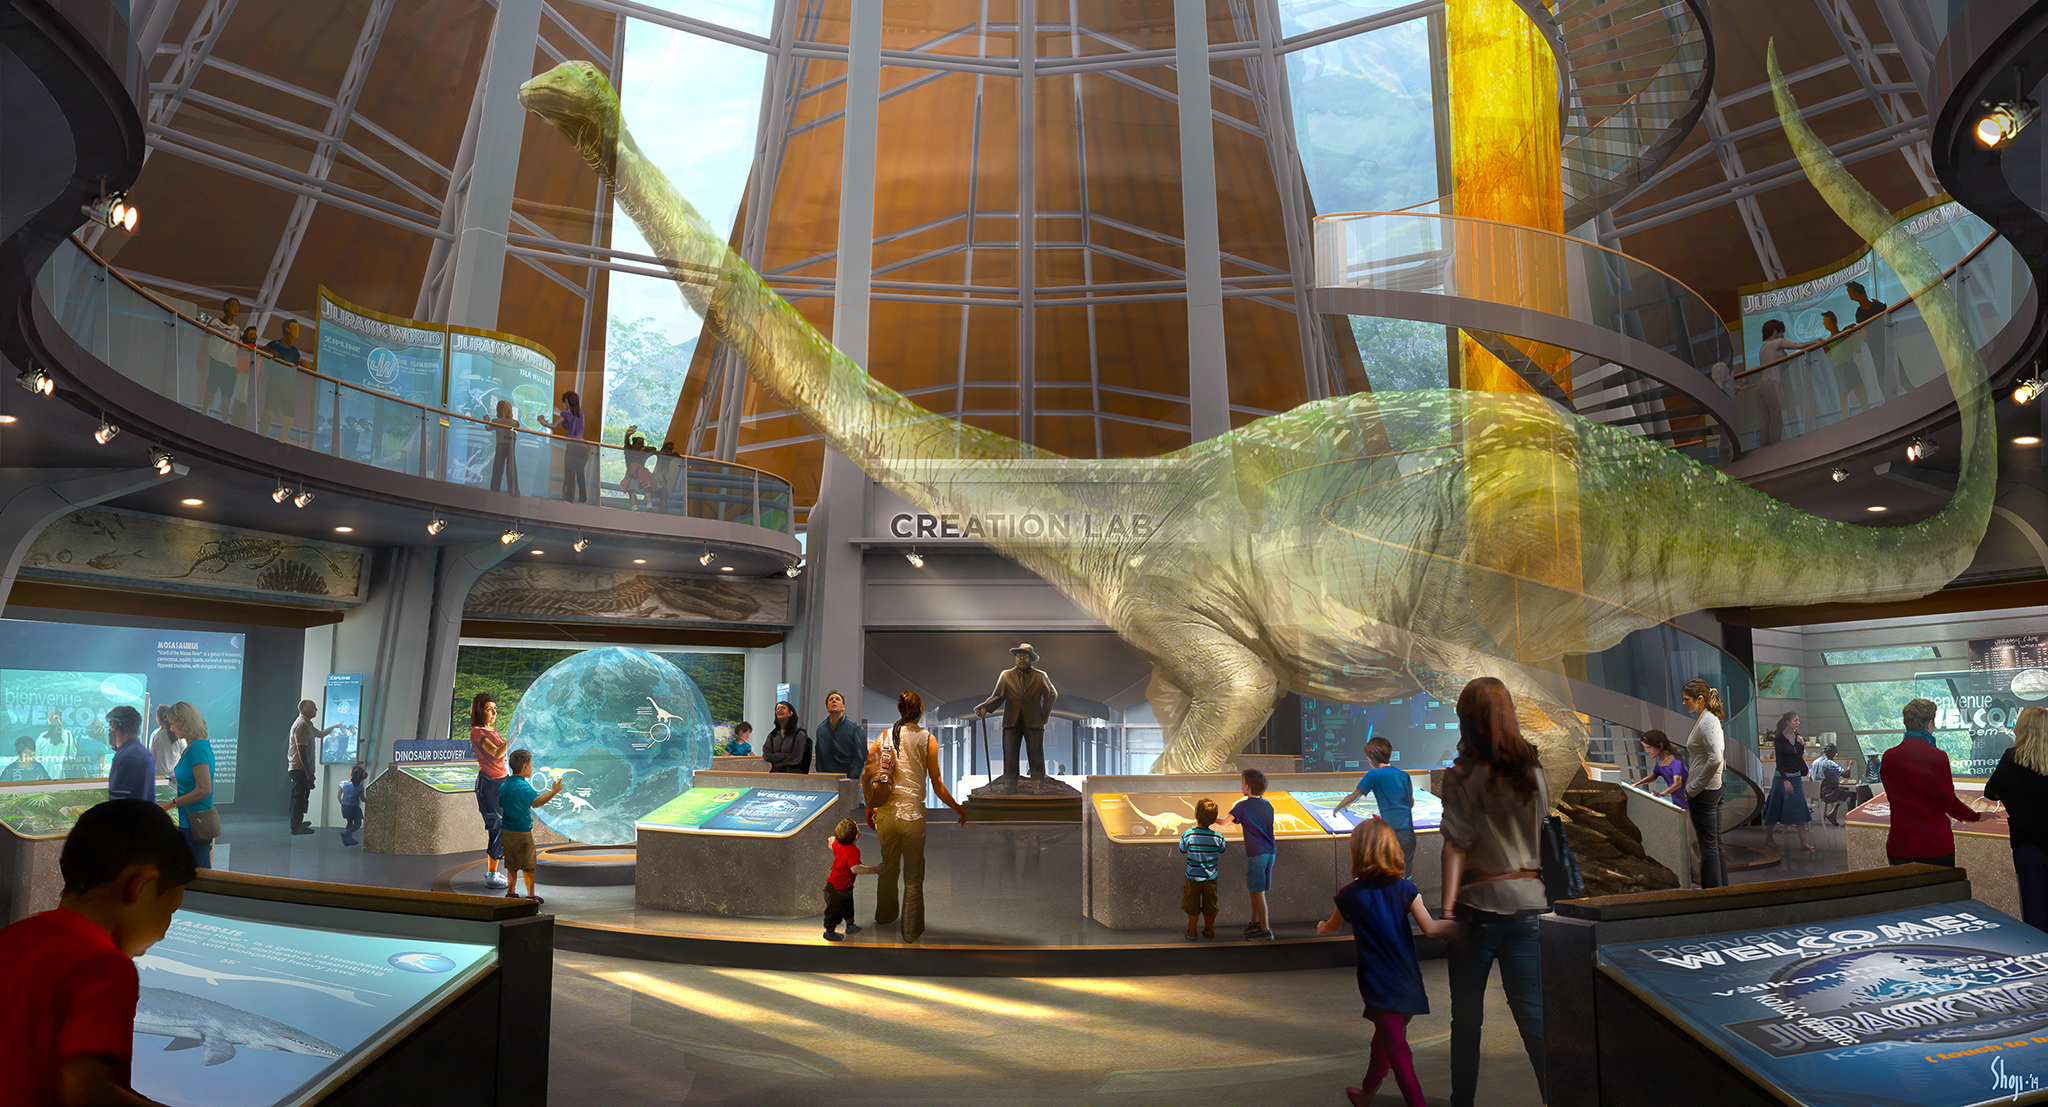 Jurassic World concept art by Craig Shoji